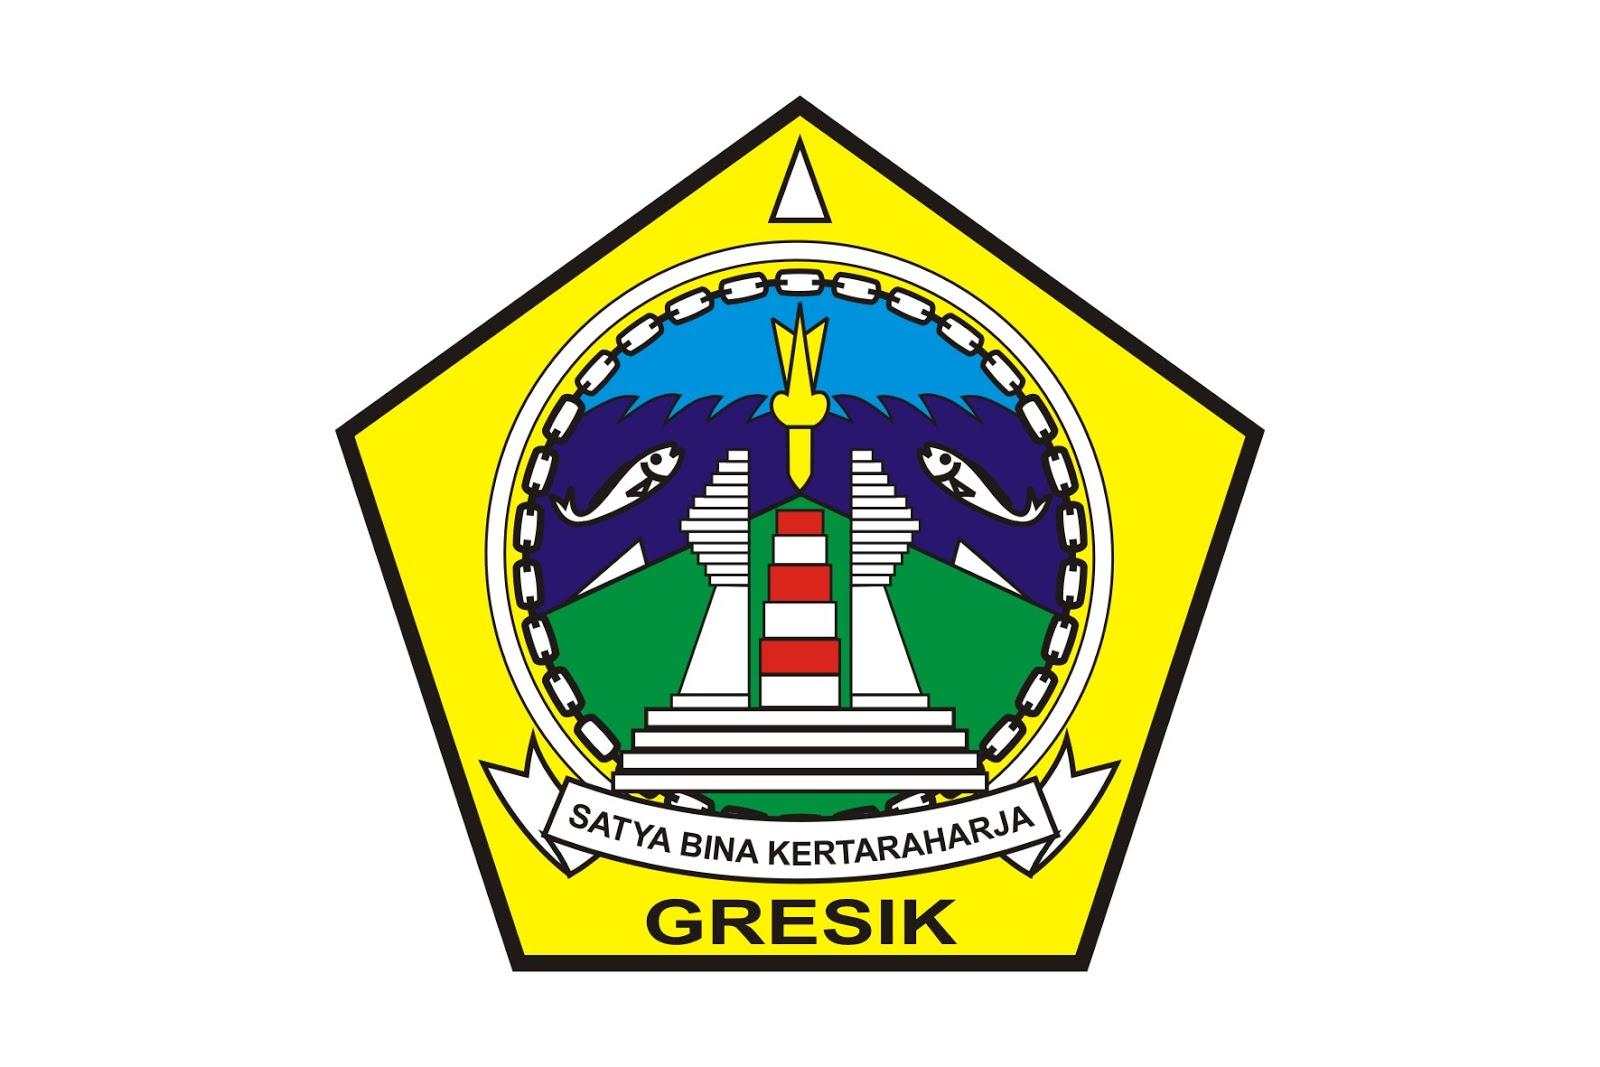 kabupaten gresik logo kabupaten gresik logo